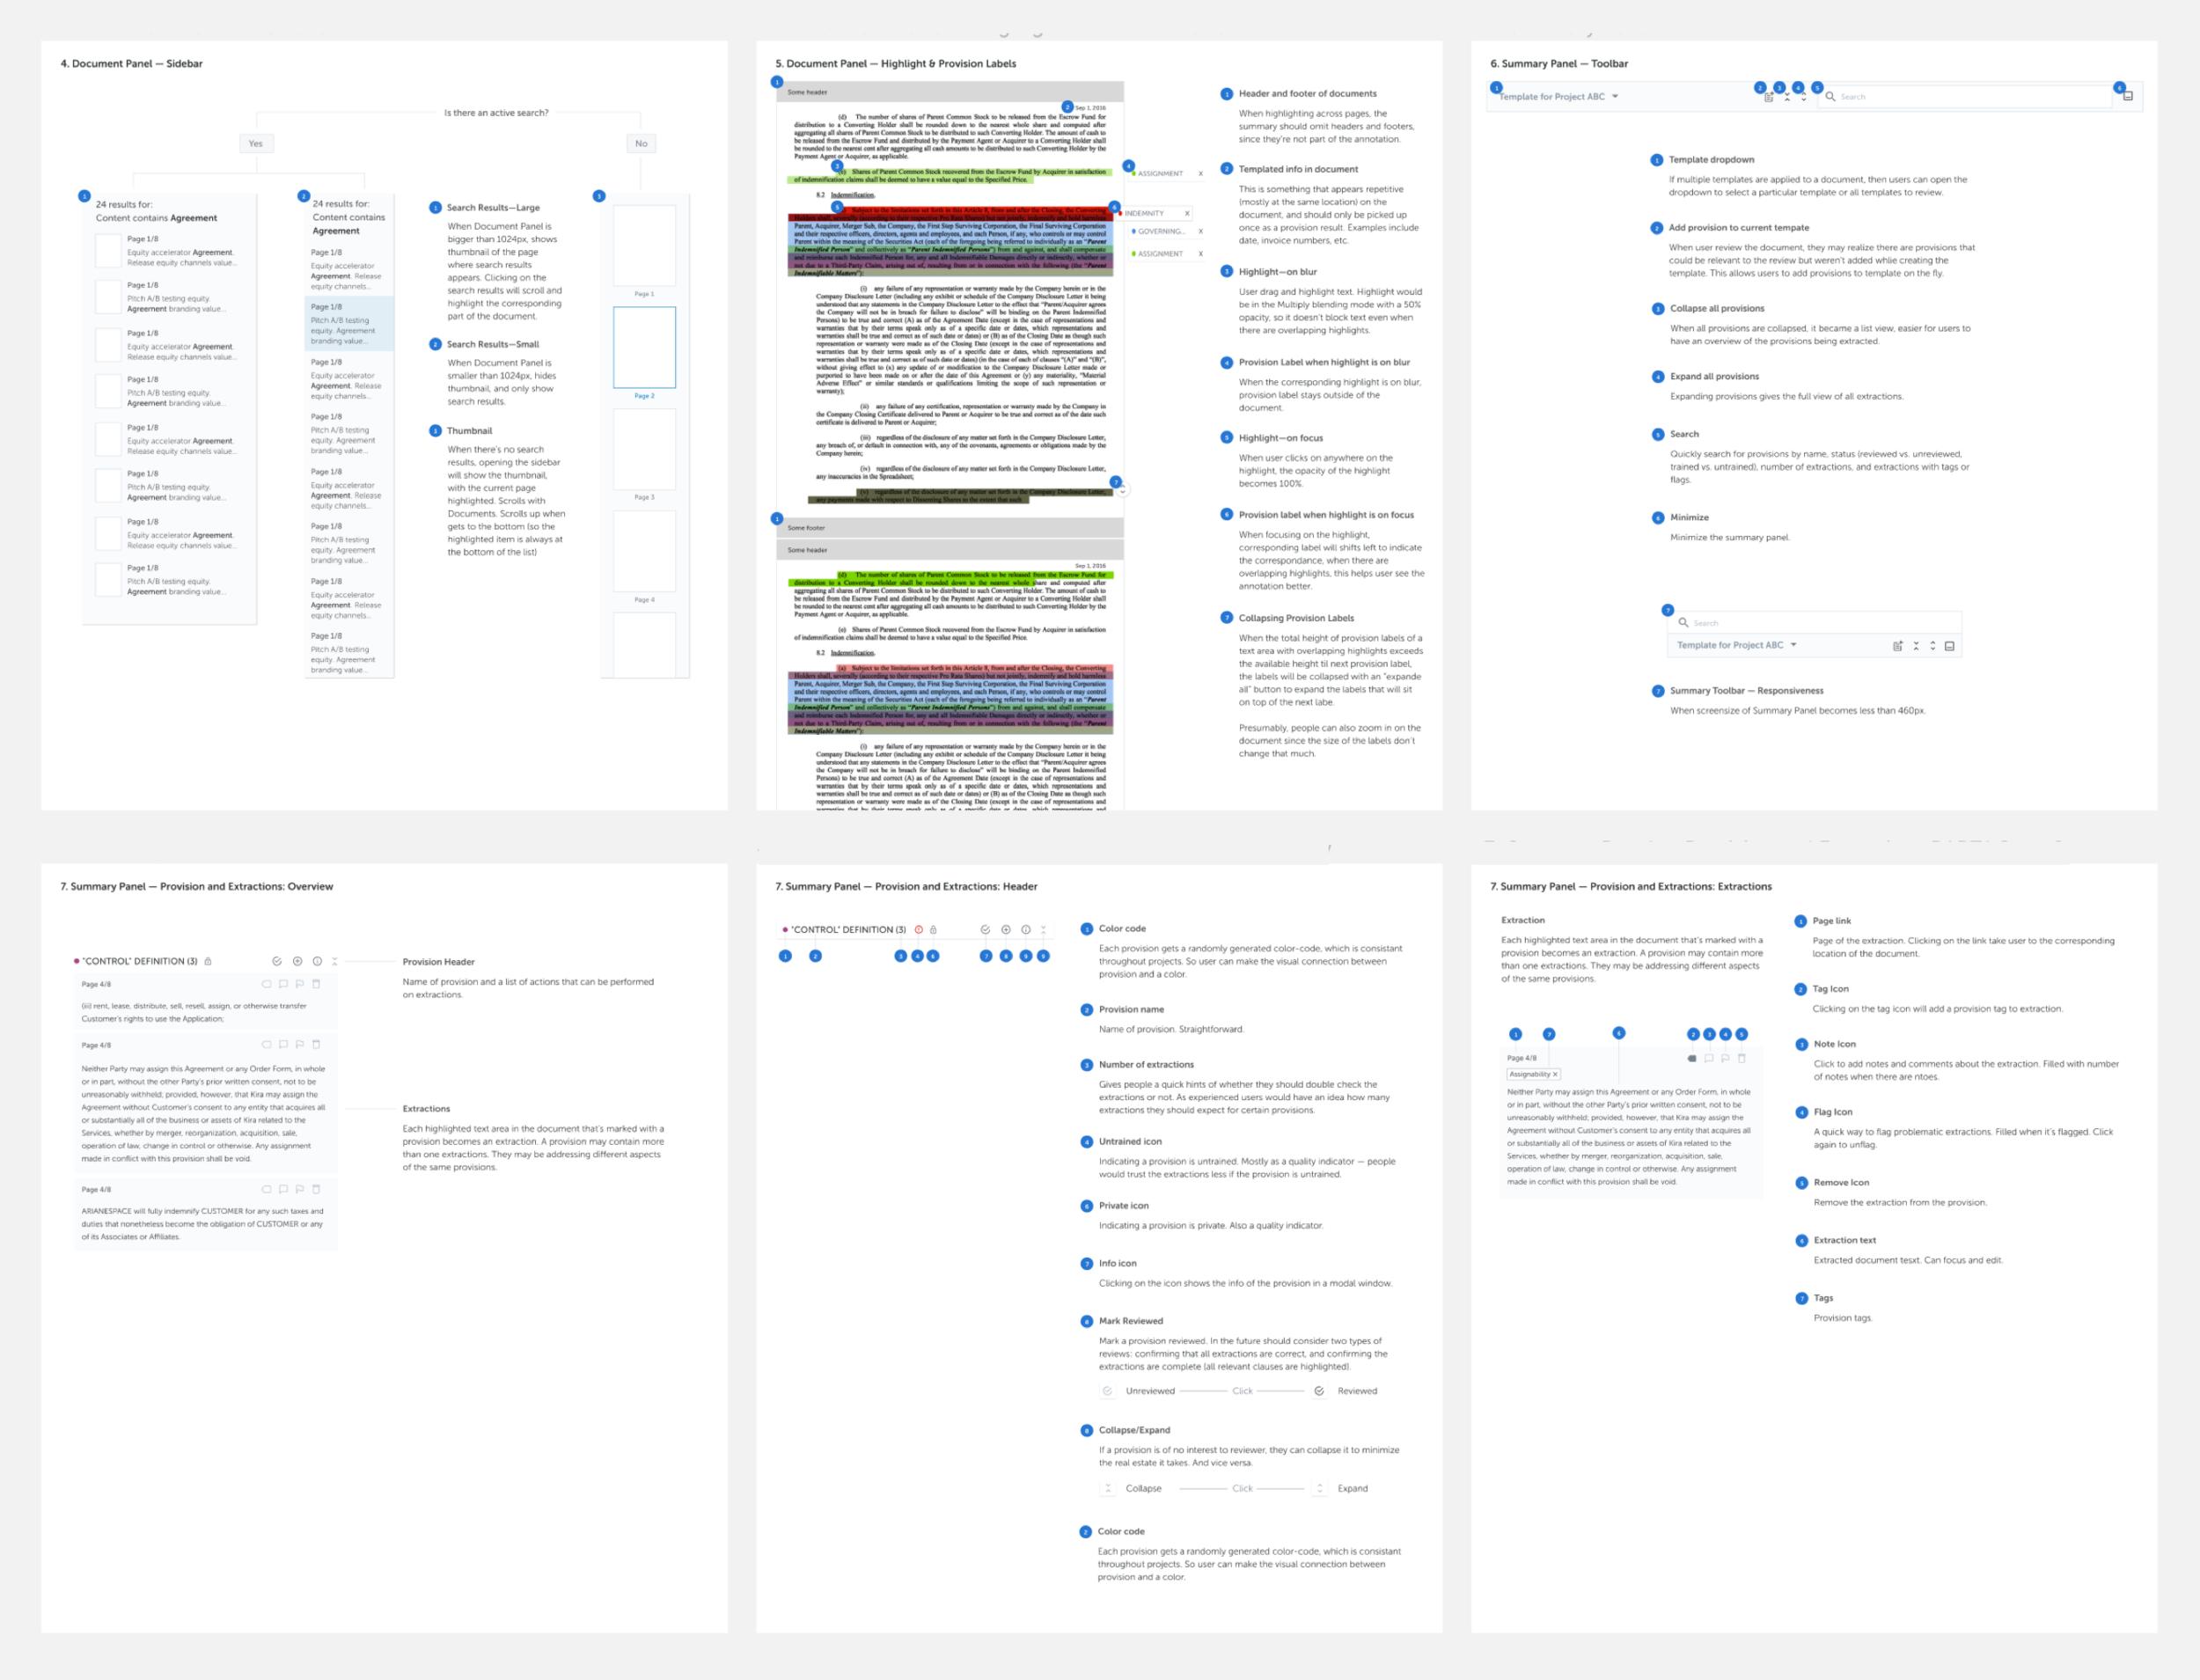 documentation-2.png